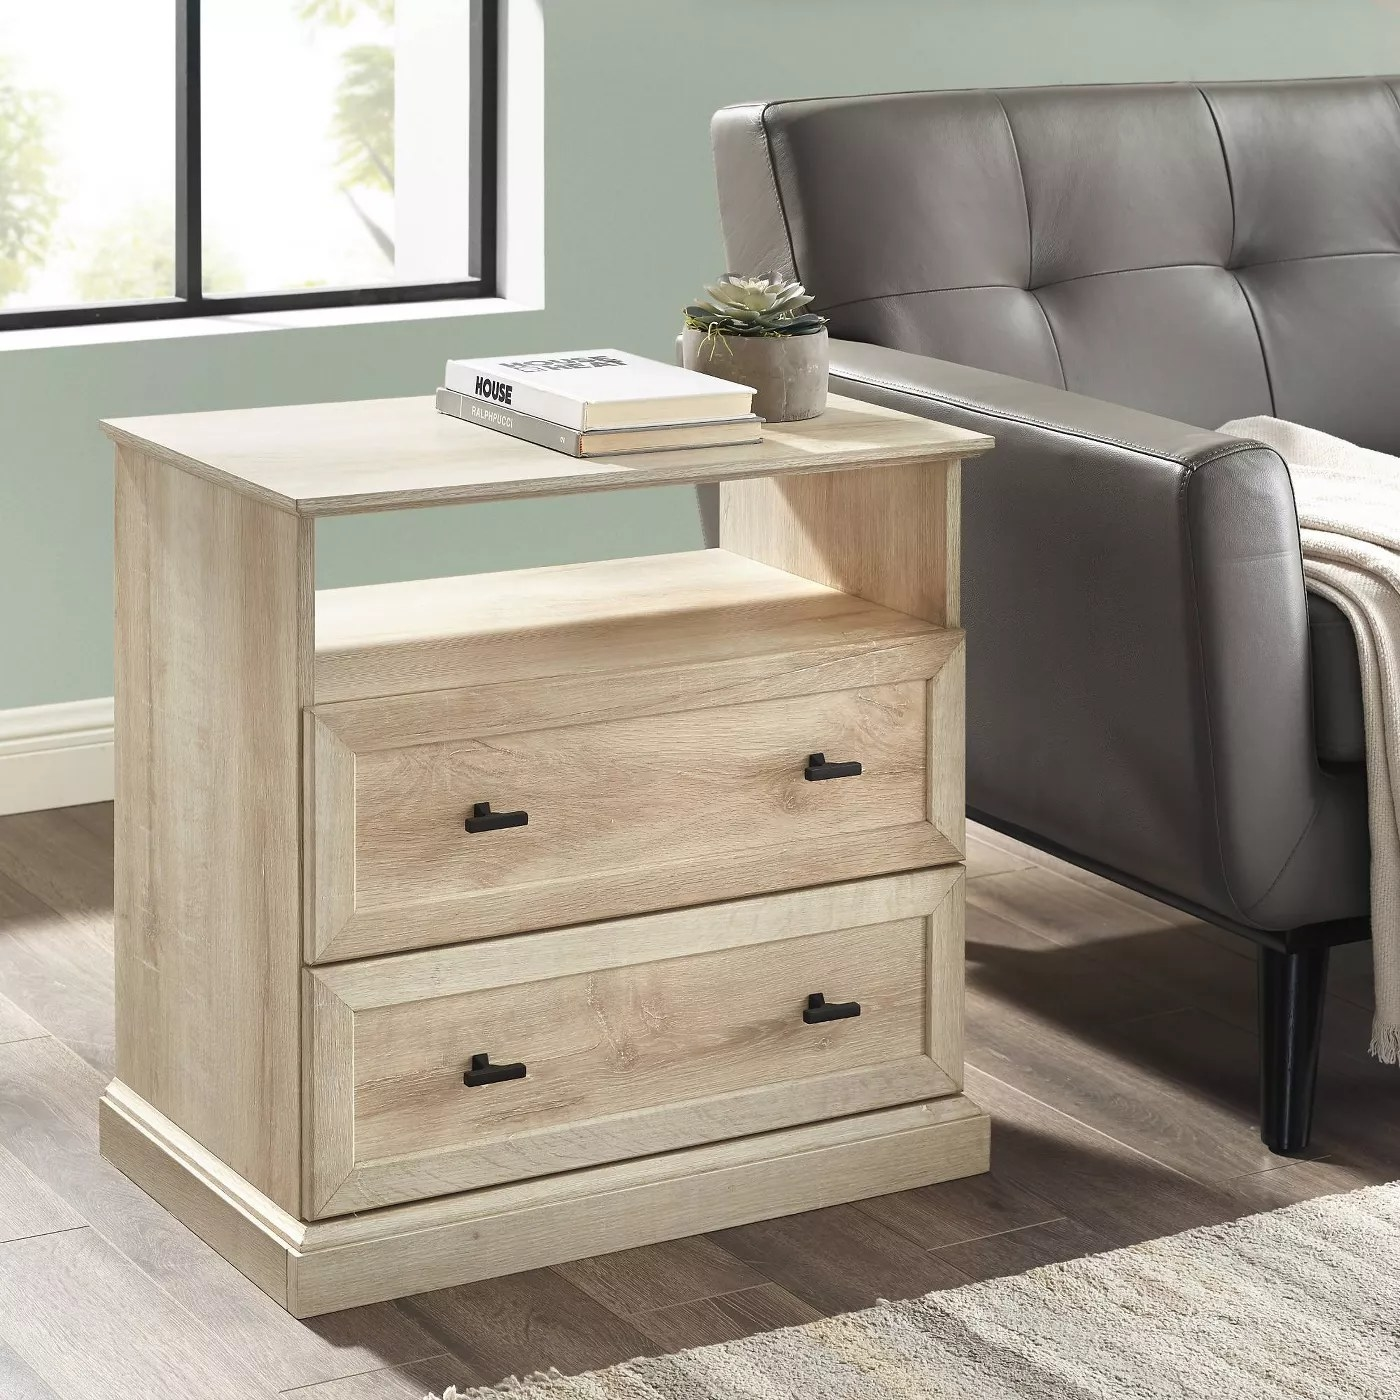 The nightstand in white oak